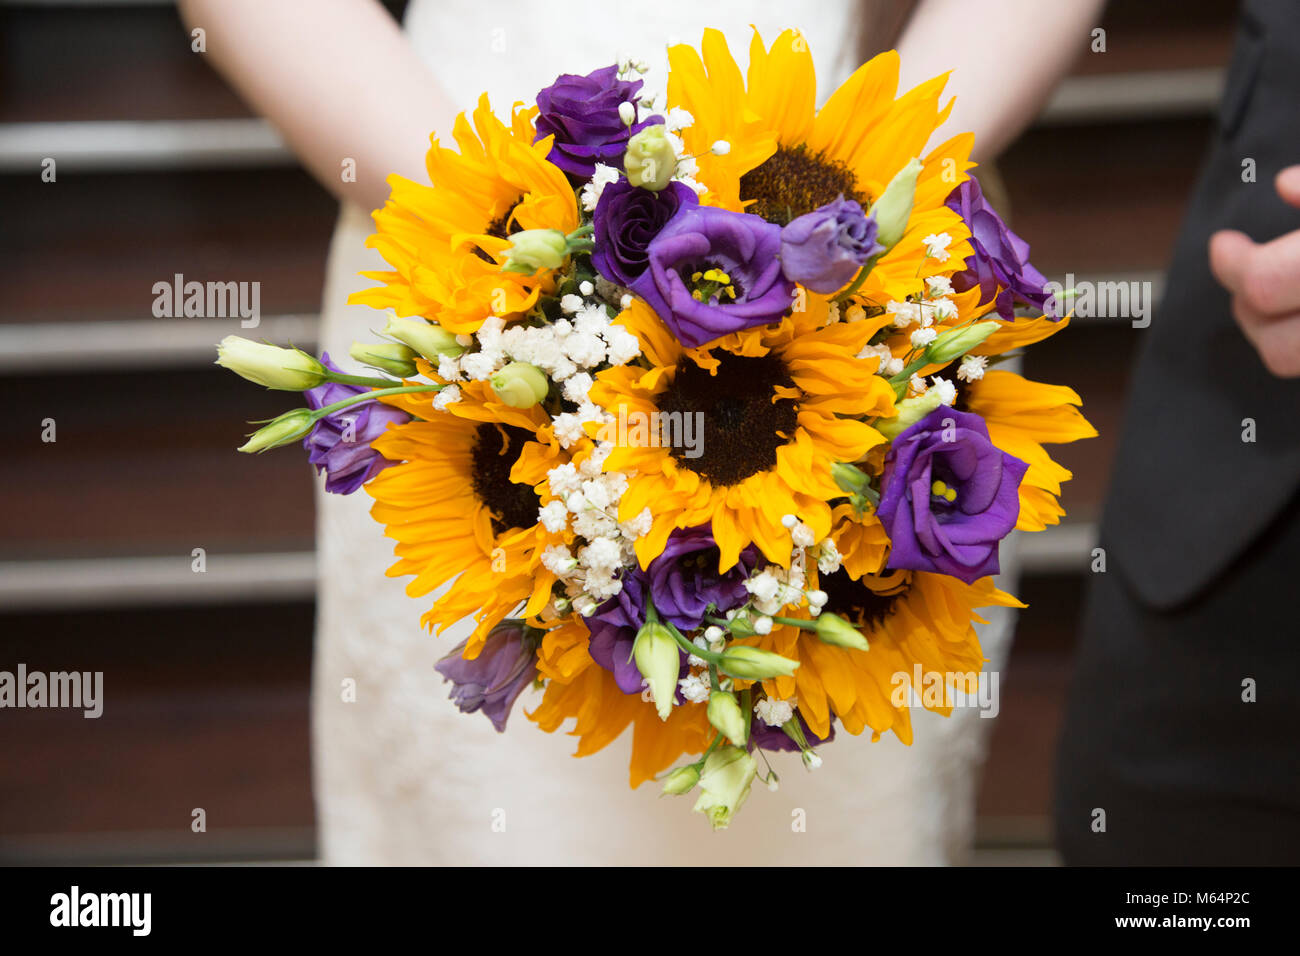 Sunflower wedding bouquet stock photo 175896740 alamy sunflower wedding bouquet junglespirit Images